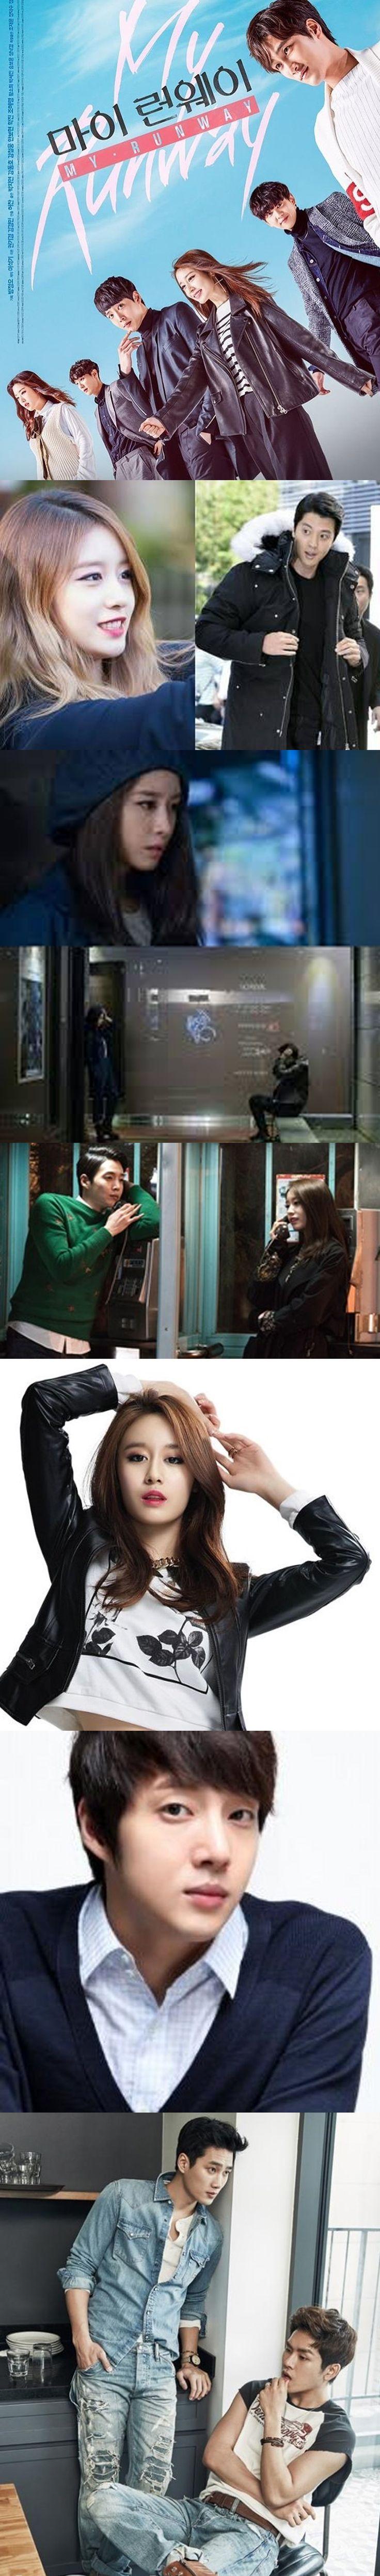 My Runway (마이 런웨이) WebDrama 2016 - 6 episodes - Park Ji Yeon / Kang Dong Ho / Kisum / Ahn Bo Hyun / Yang Hak Jin